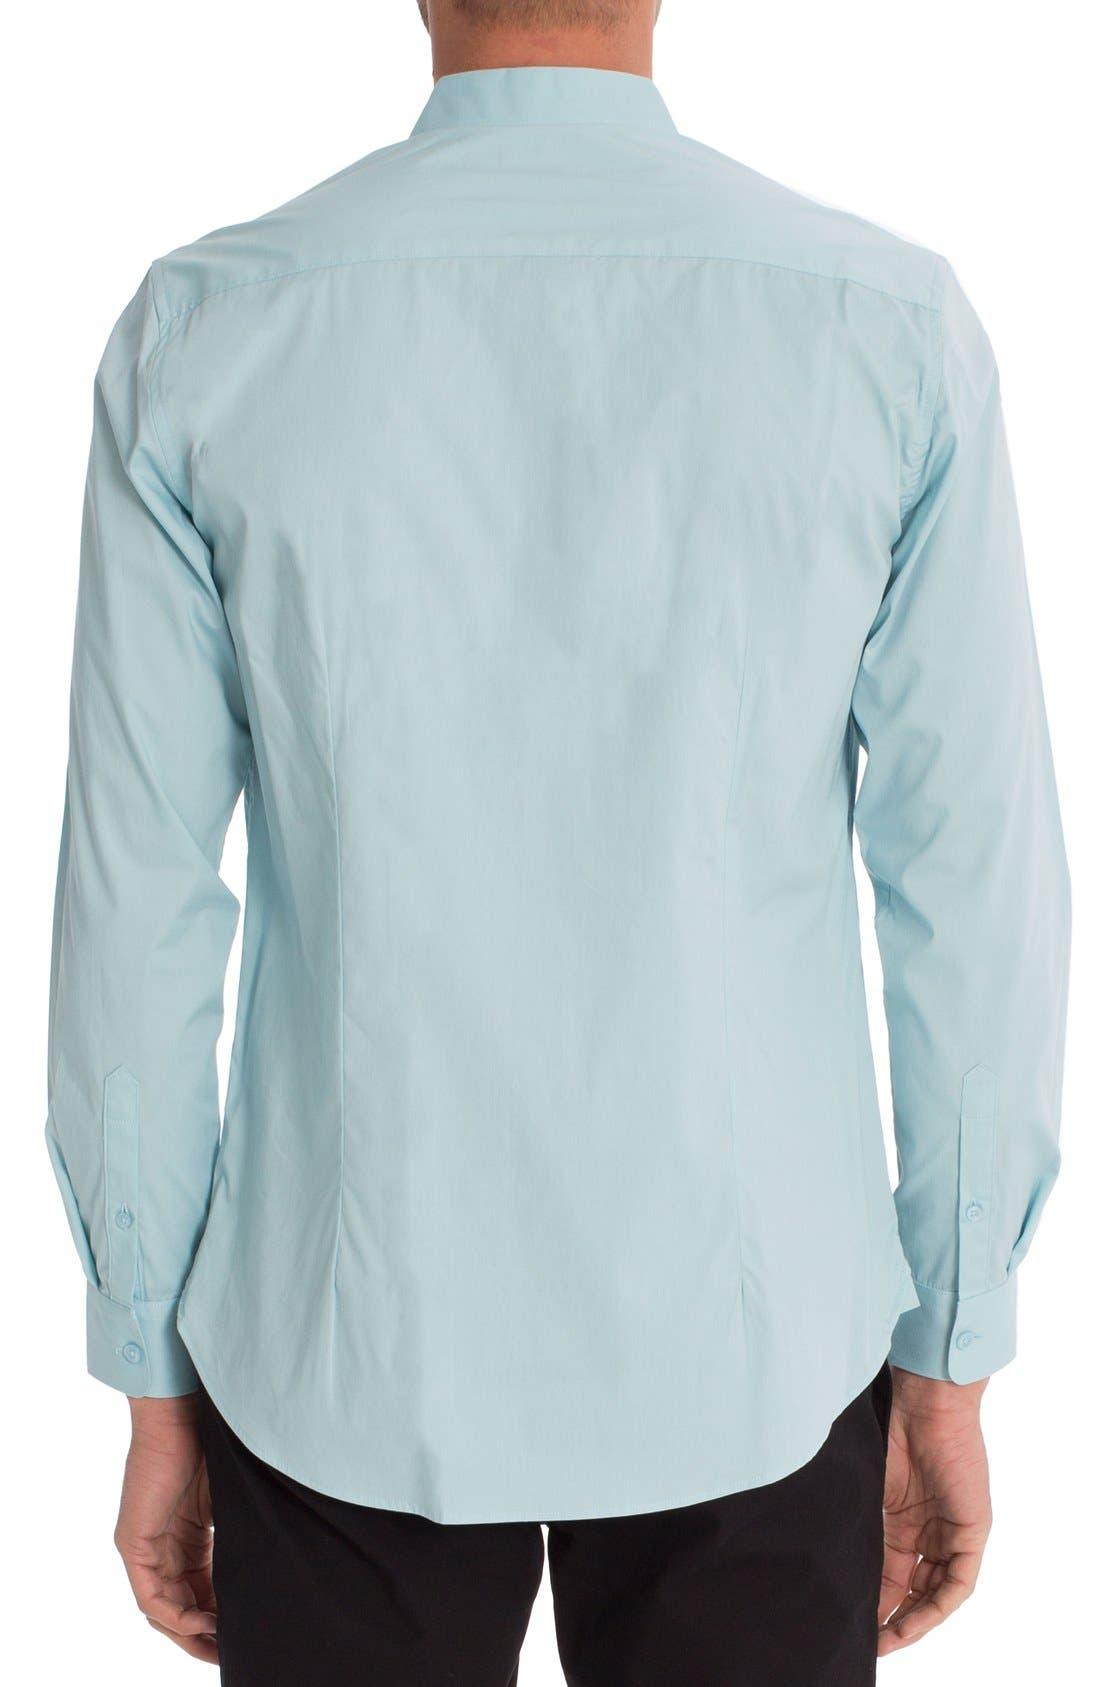 'Peace Train' Trim Fit Woven Shirt,                             Alternate thumbnail 2, color,                             Sterling Blue